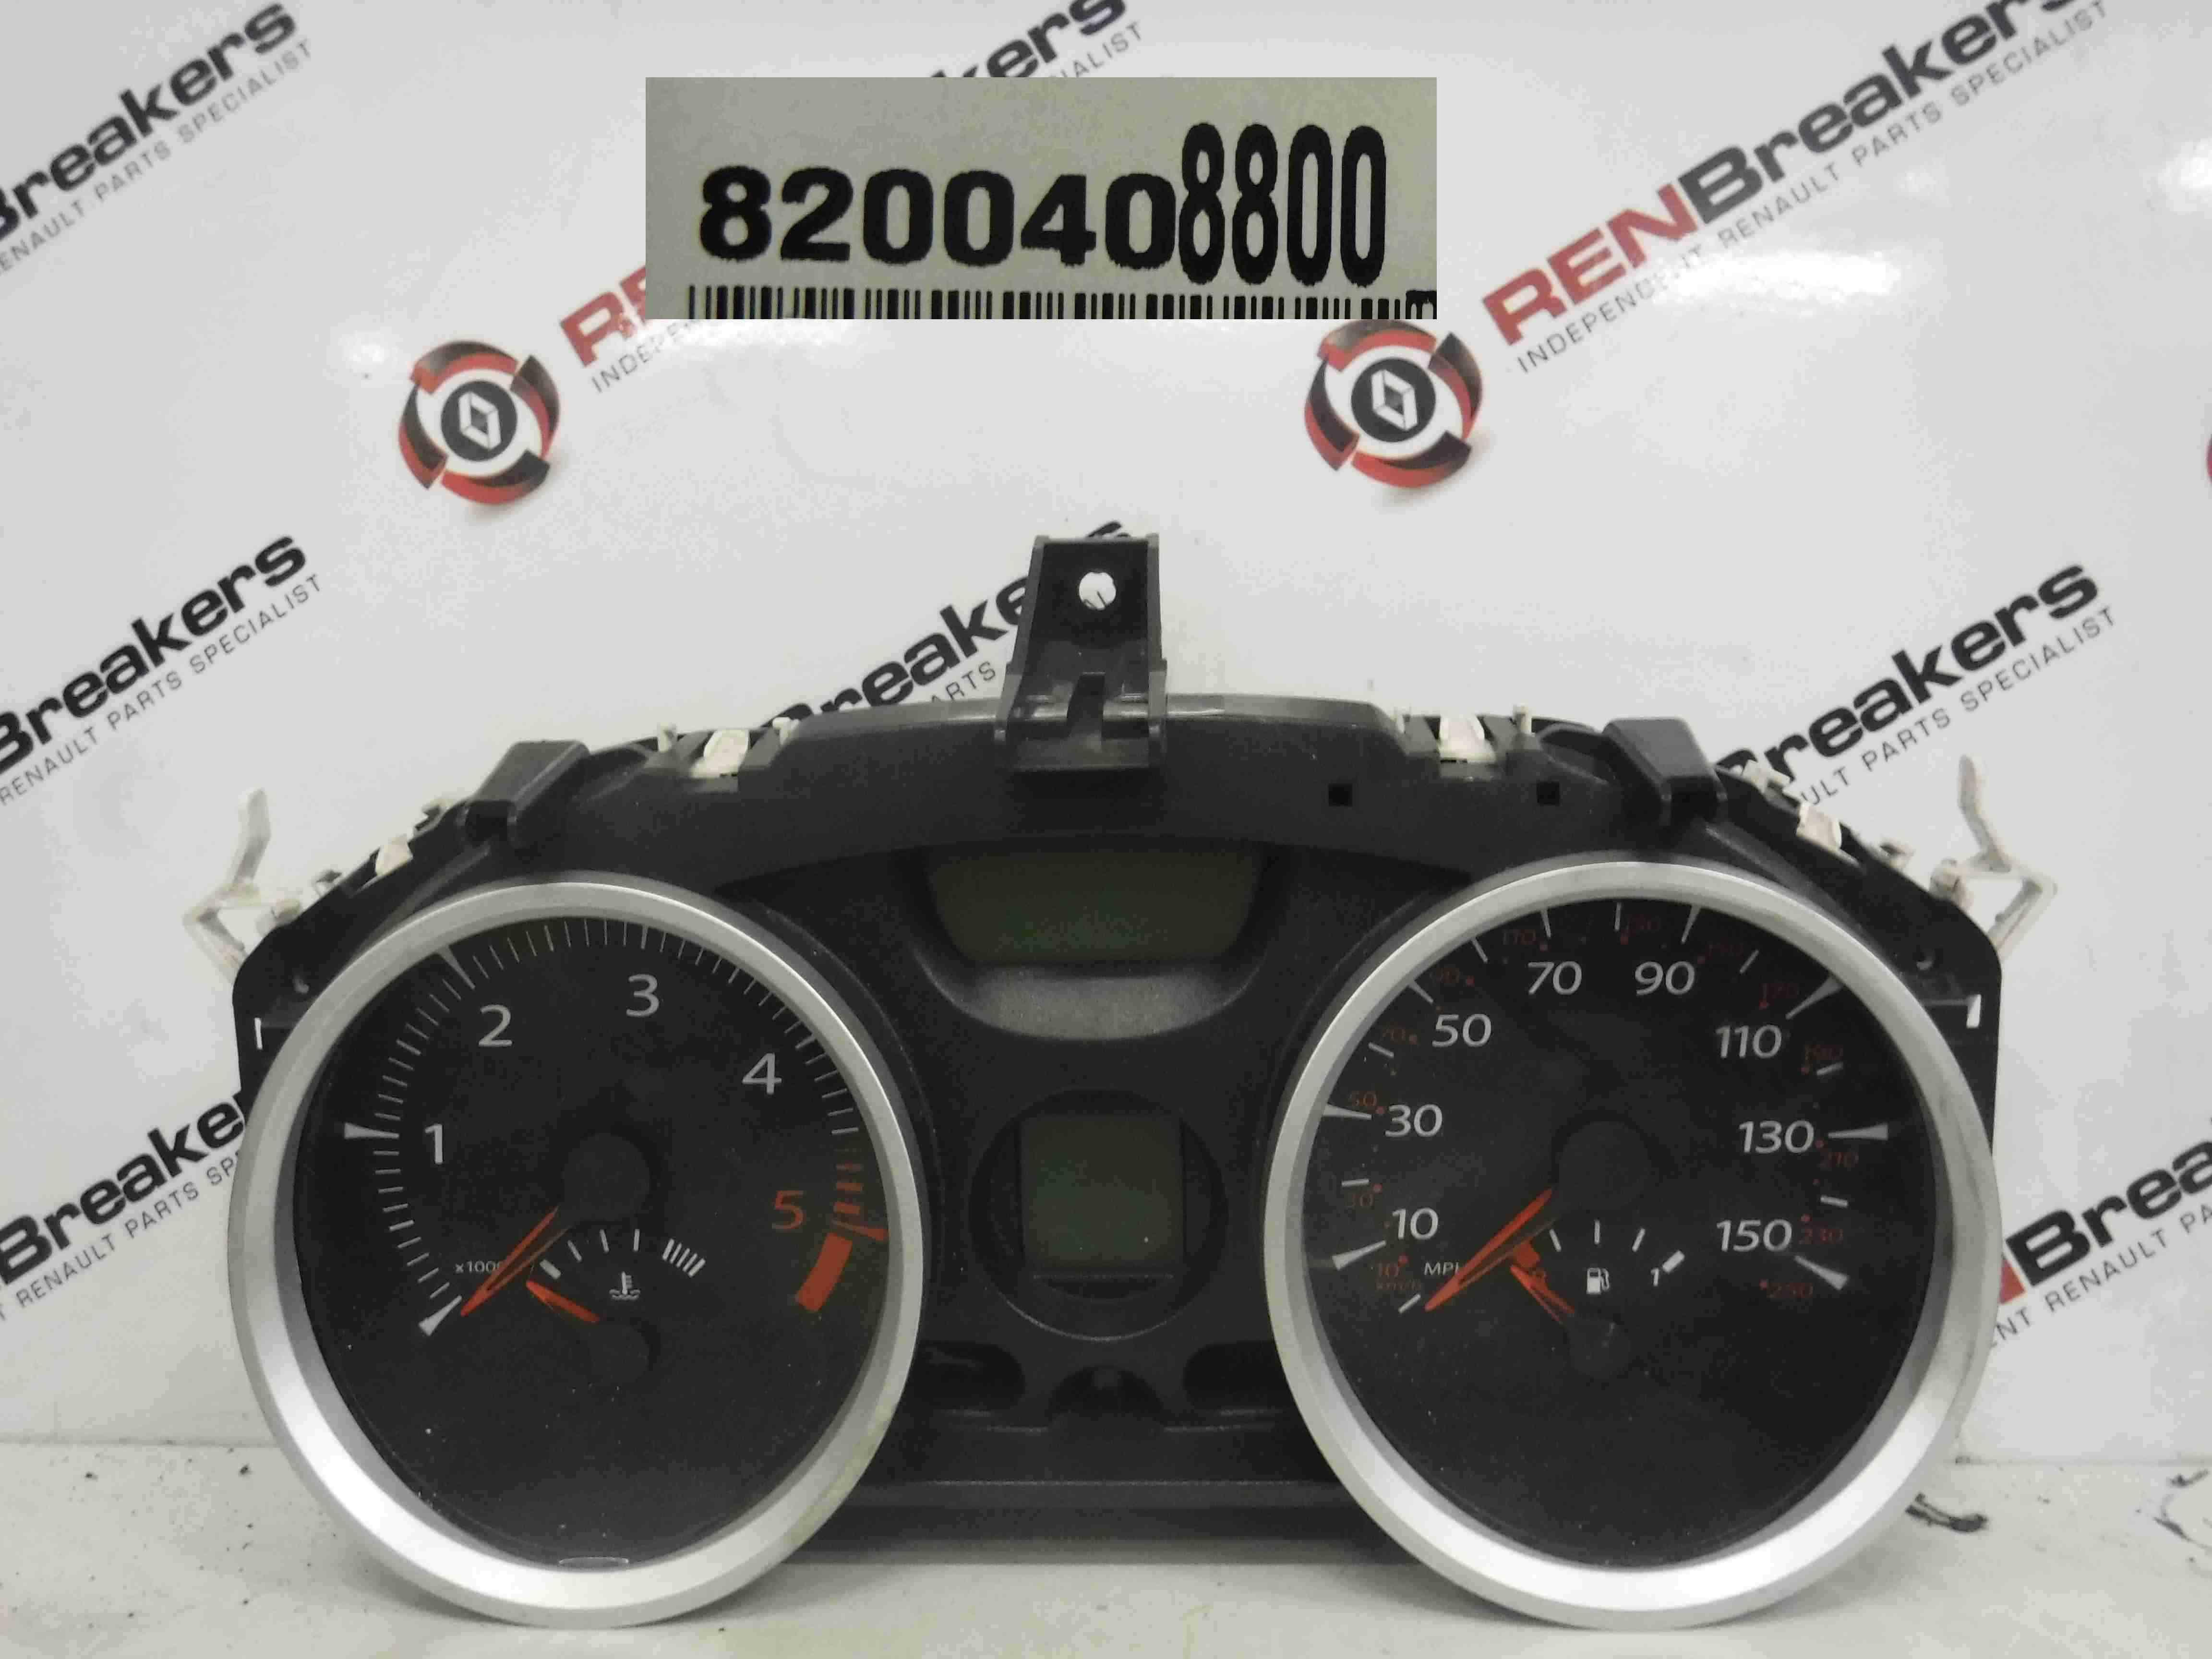 Renault Megane 2002-2008 Instrument Panel Clocks Dials 8200408800